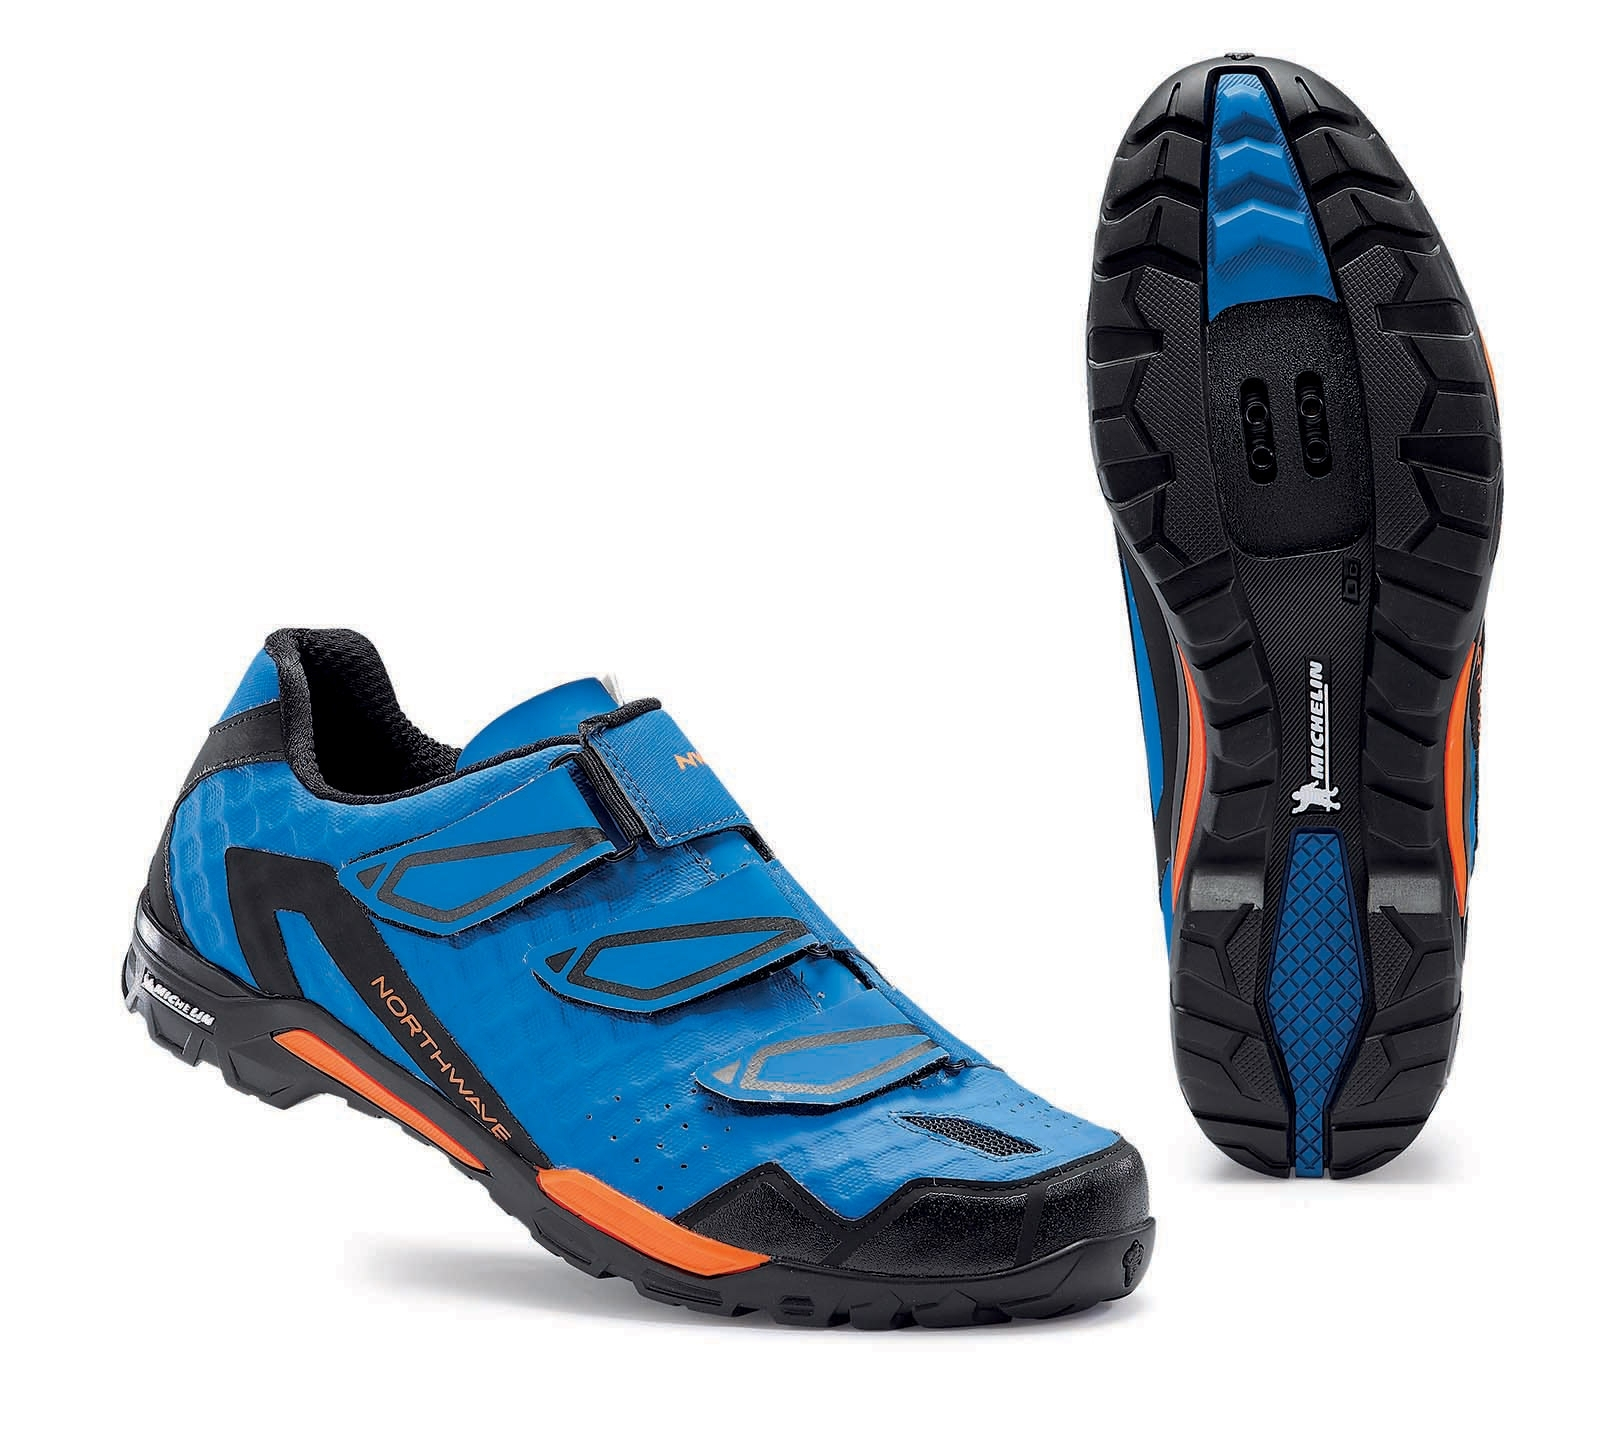 NORTHWAVE Man MTB trail shoes OUTCROSS blue